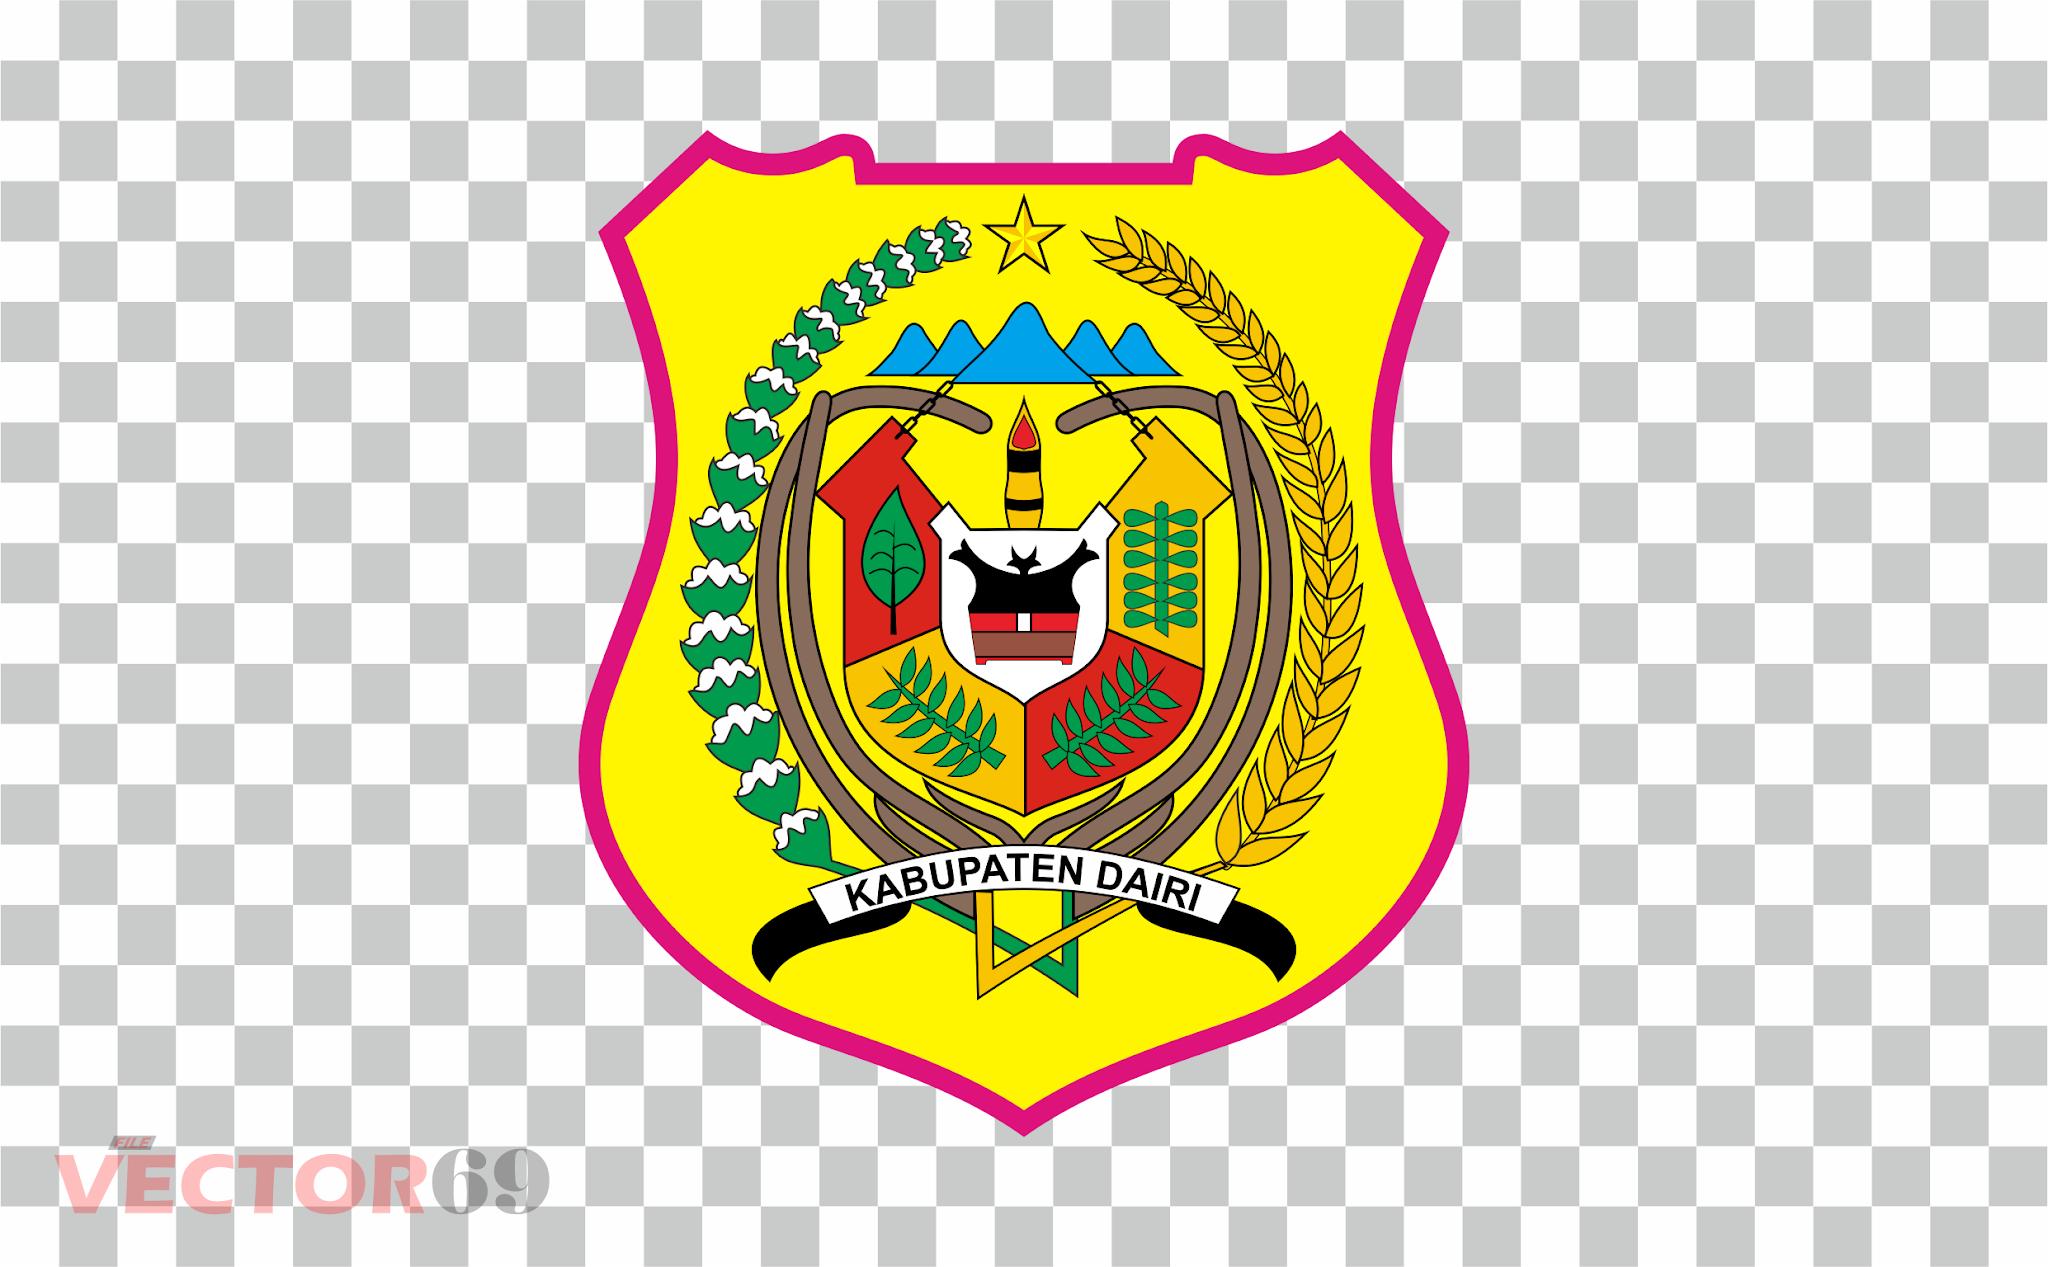 Kabupaten Dairi Logo - Download Vector File PNG (Portable Network Graphics)